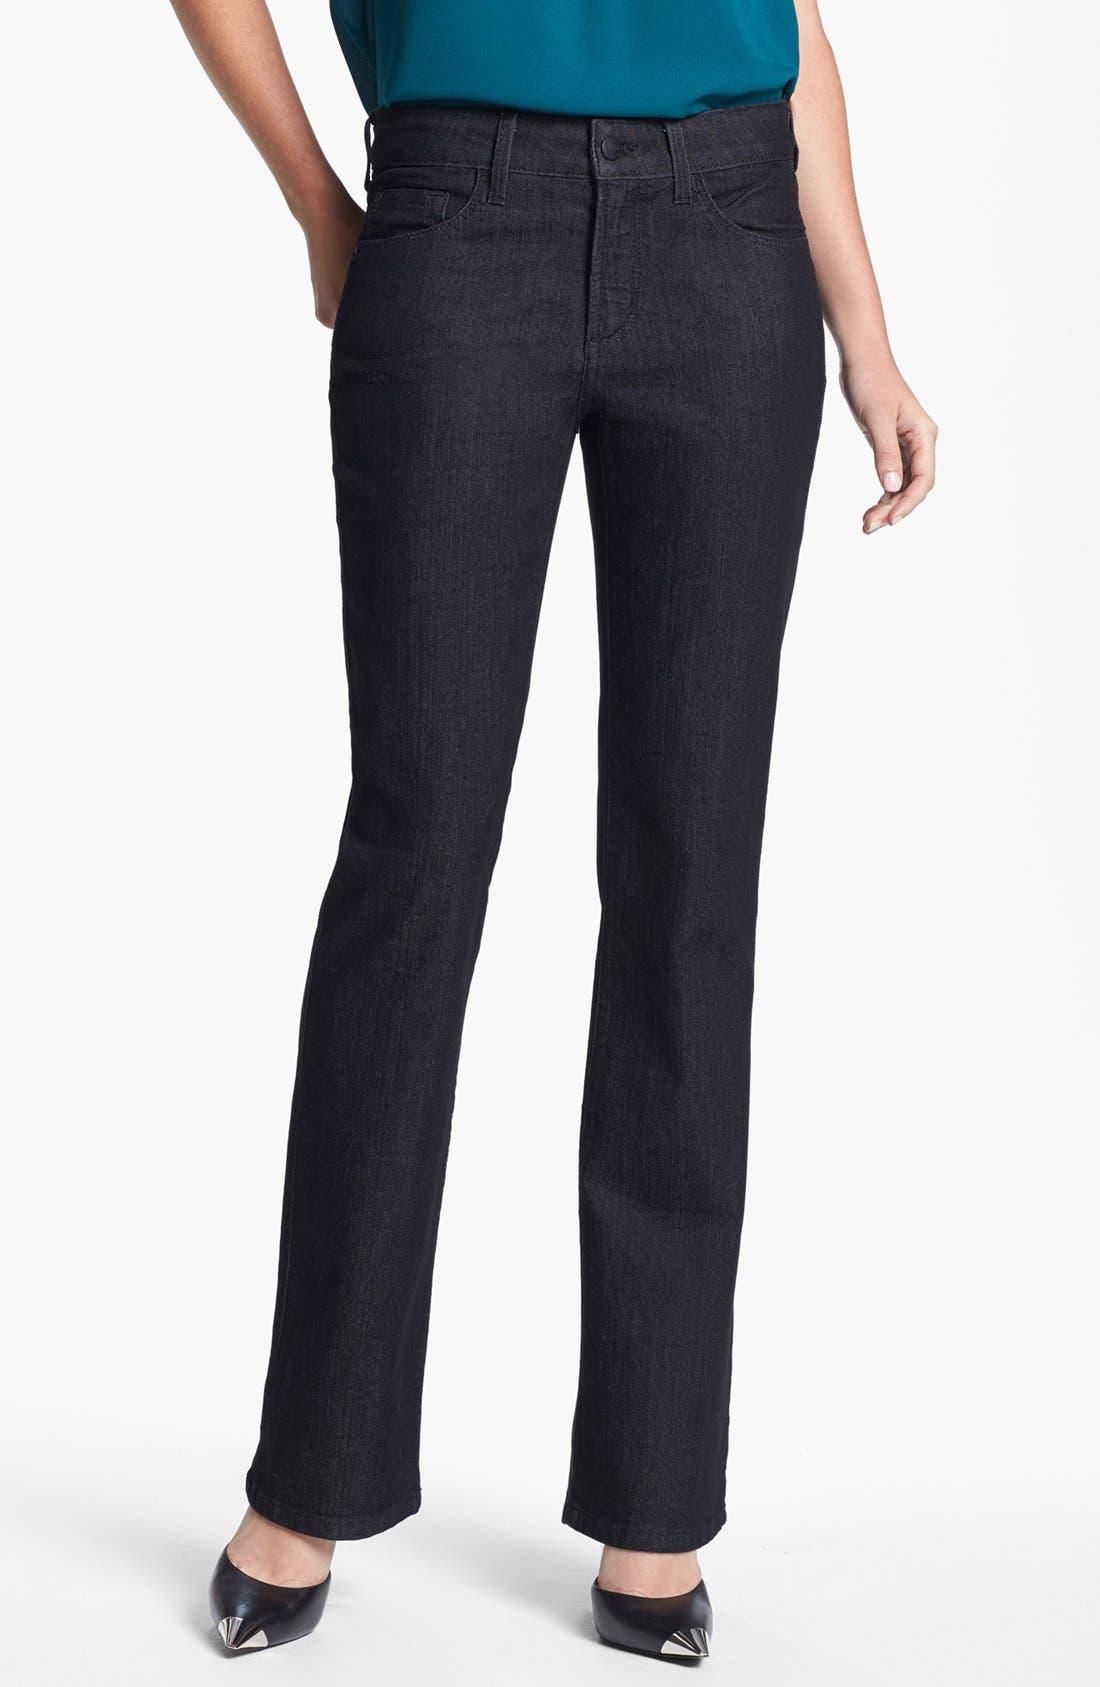 Main Image - NYDJ 'Barbara' Embellished Pocket Stretch Bootcut Jeans (Dark Enzyme)